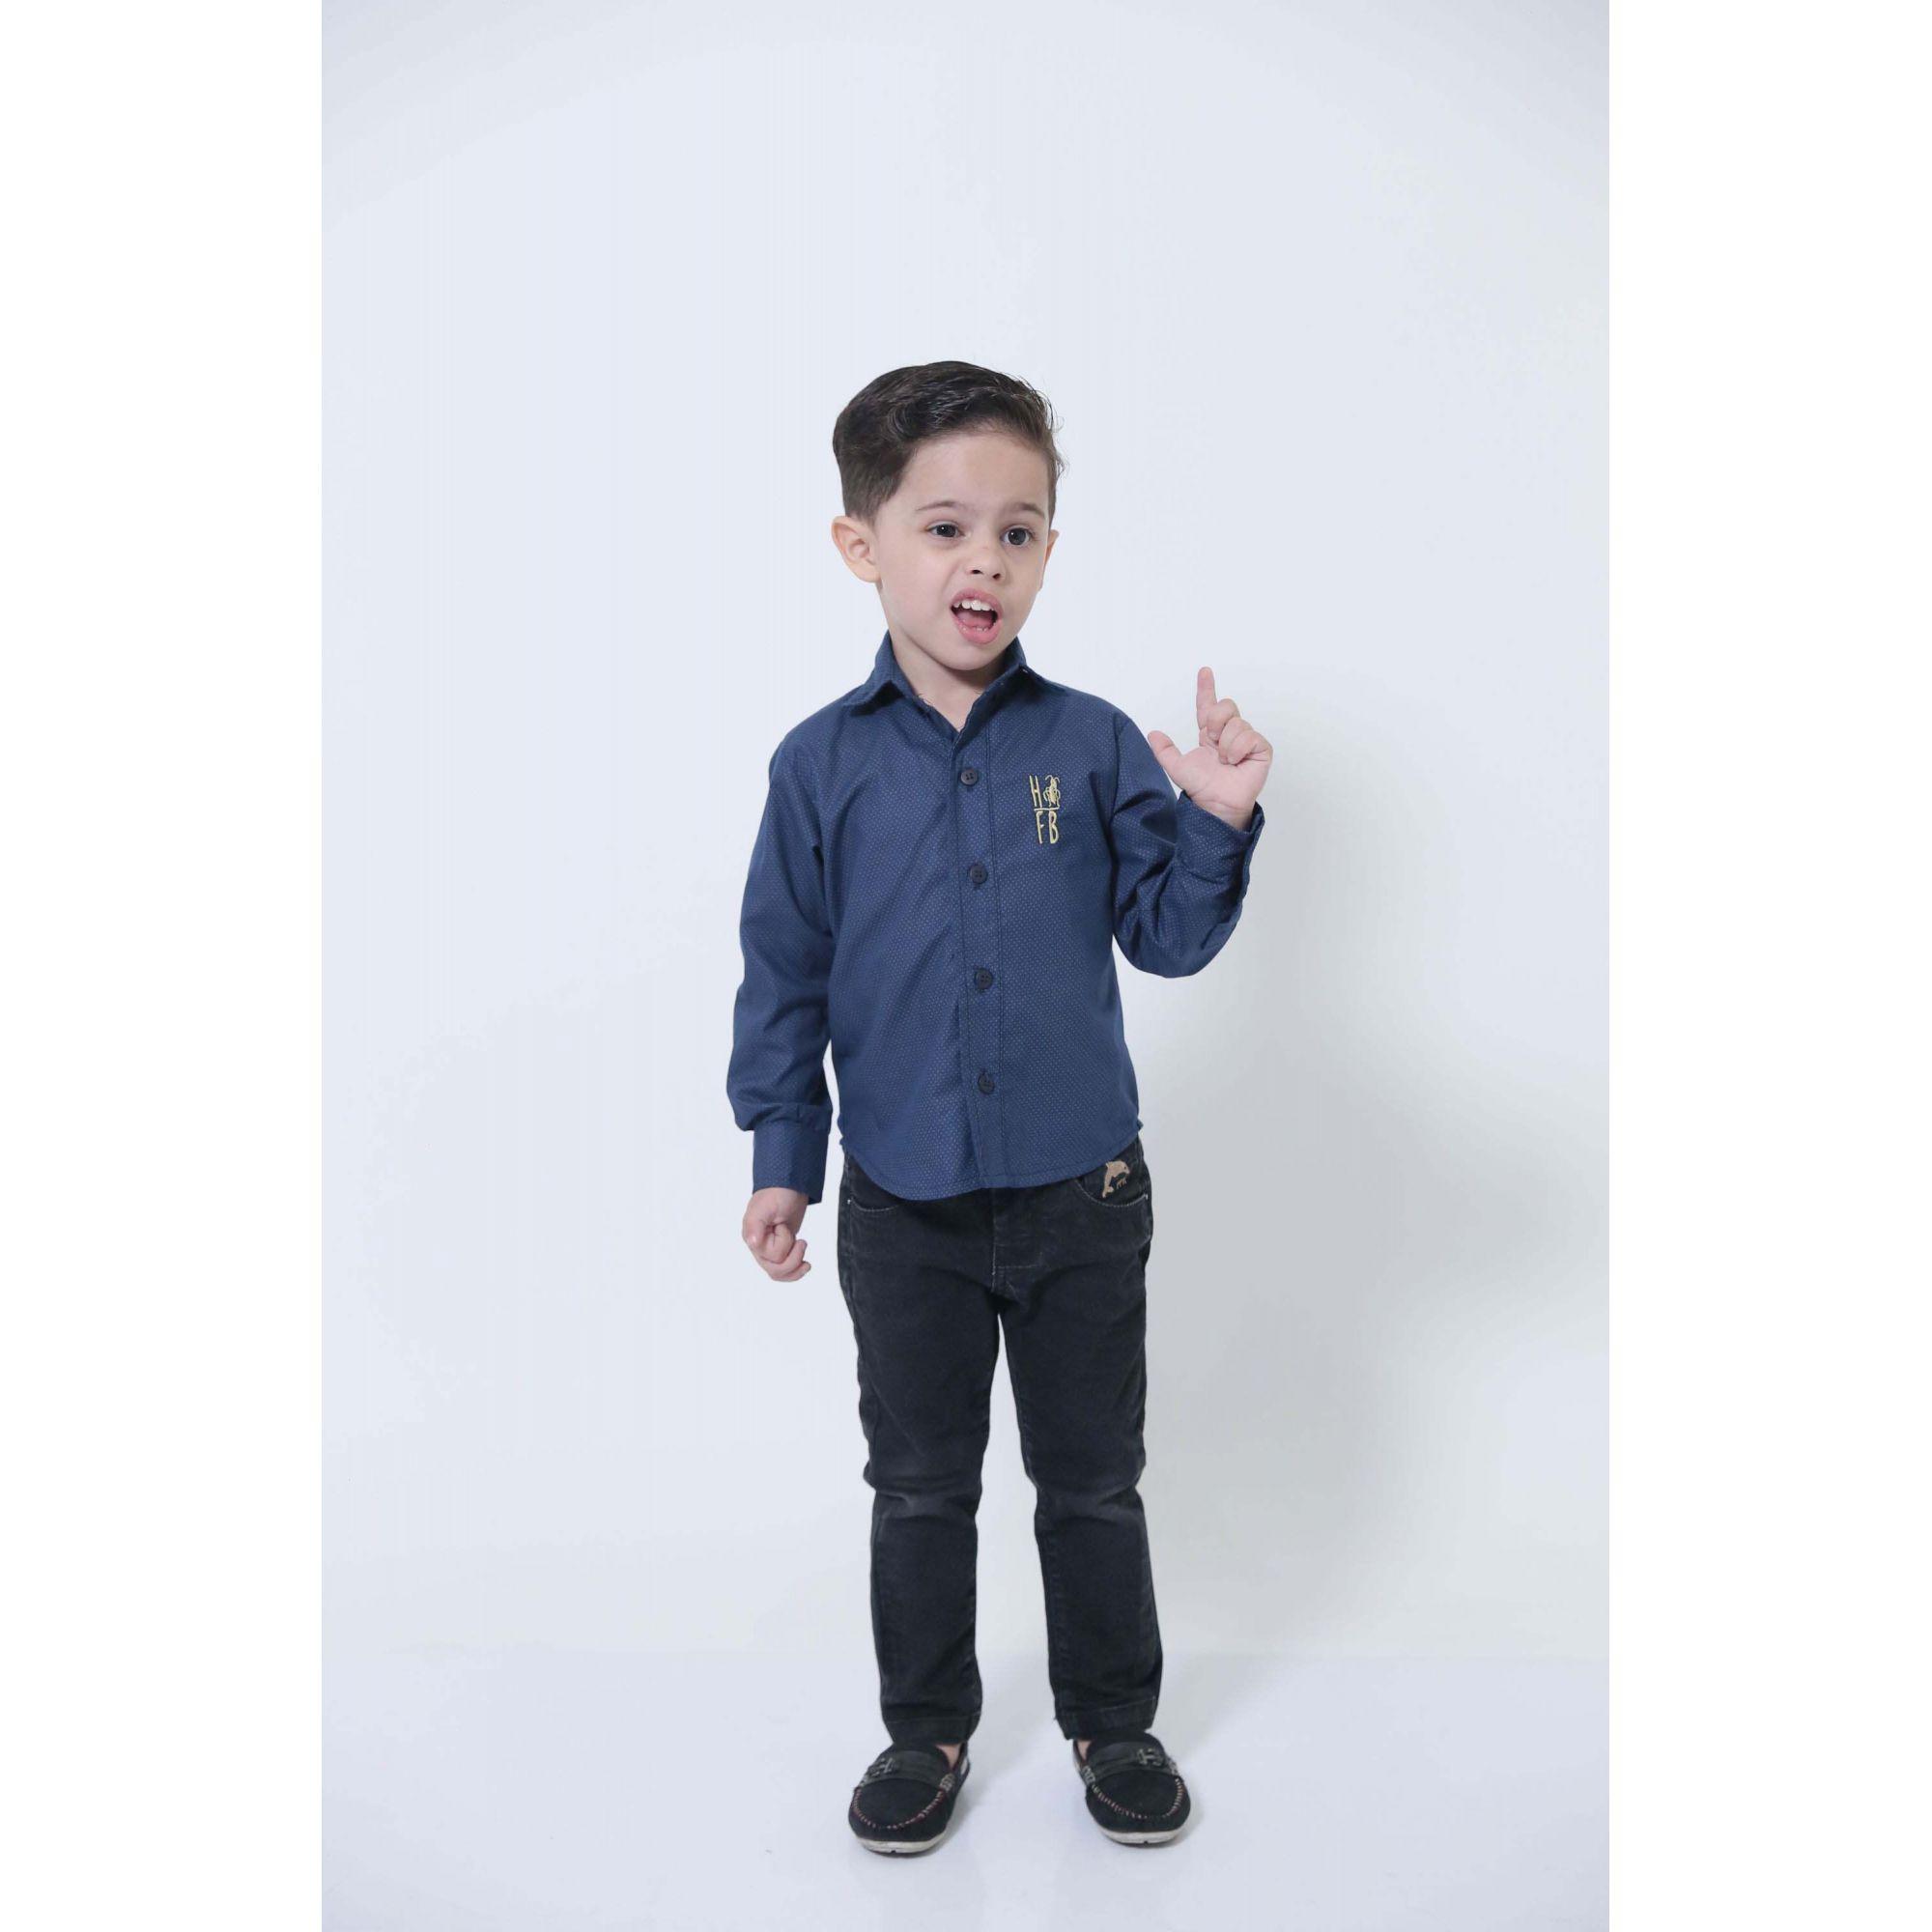 MÃE E FILHOS > Kit 02 Camisas Social Azul Marinho Steve Seagal [Coleção Tal Mãe Tal Filho]  - Heitor Fashion Brazil